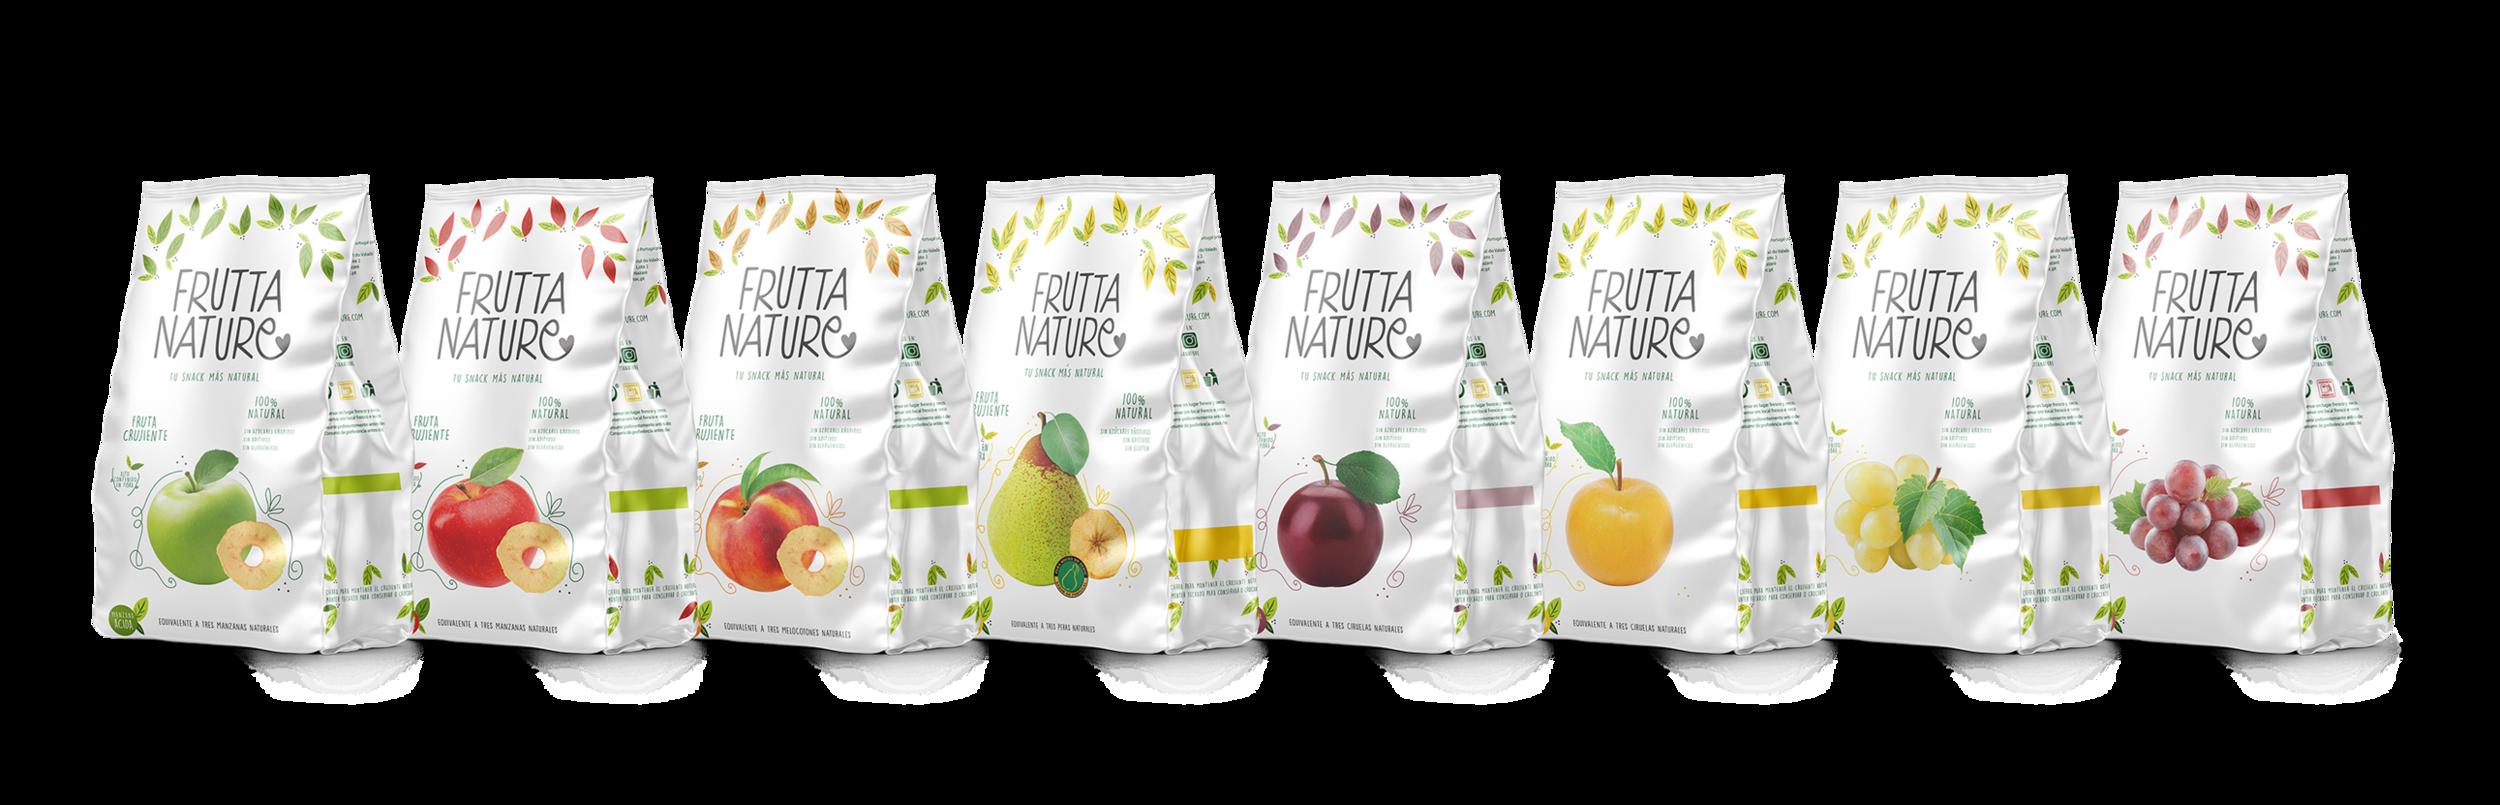 frutta nature snack saudavel